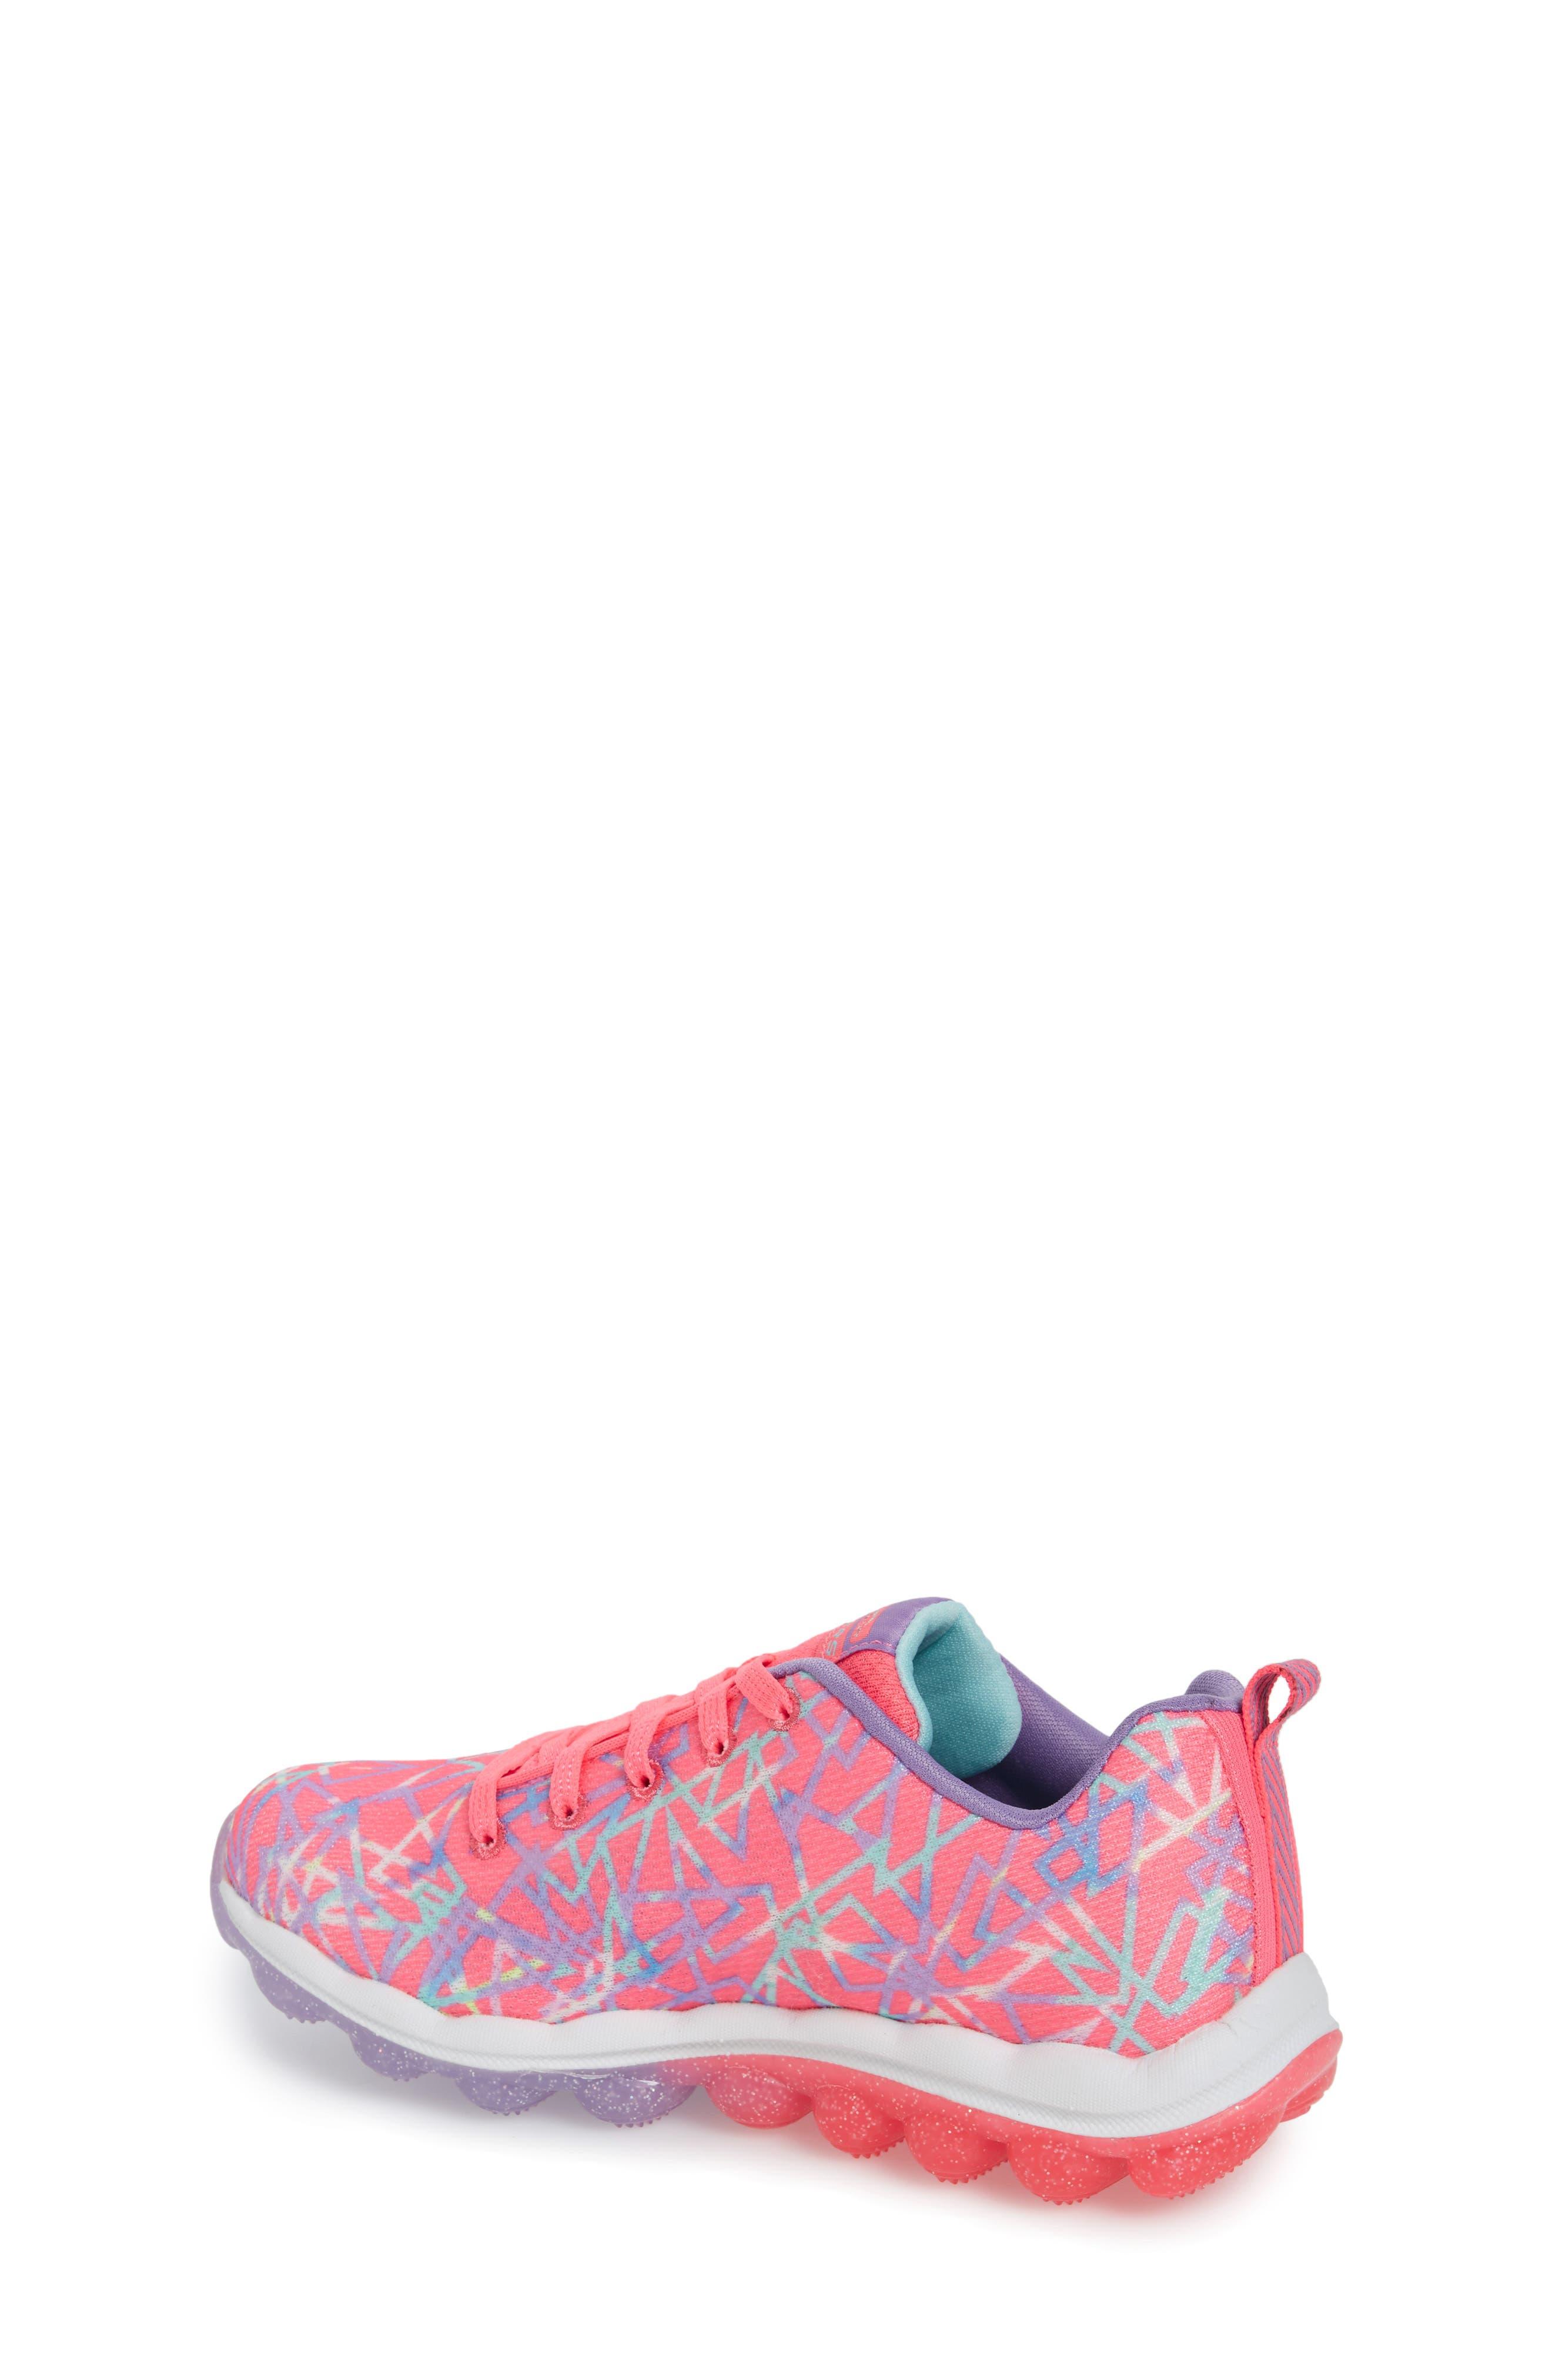 Skech-Air Sneaker,                             Alternate thumbnail 2, color,                             650